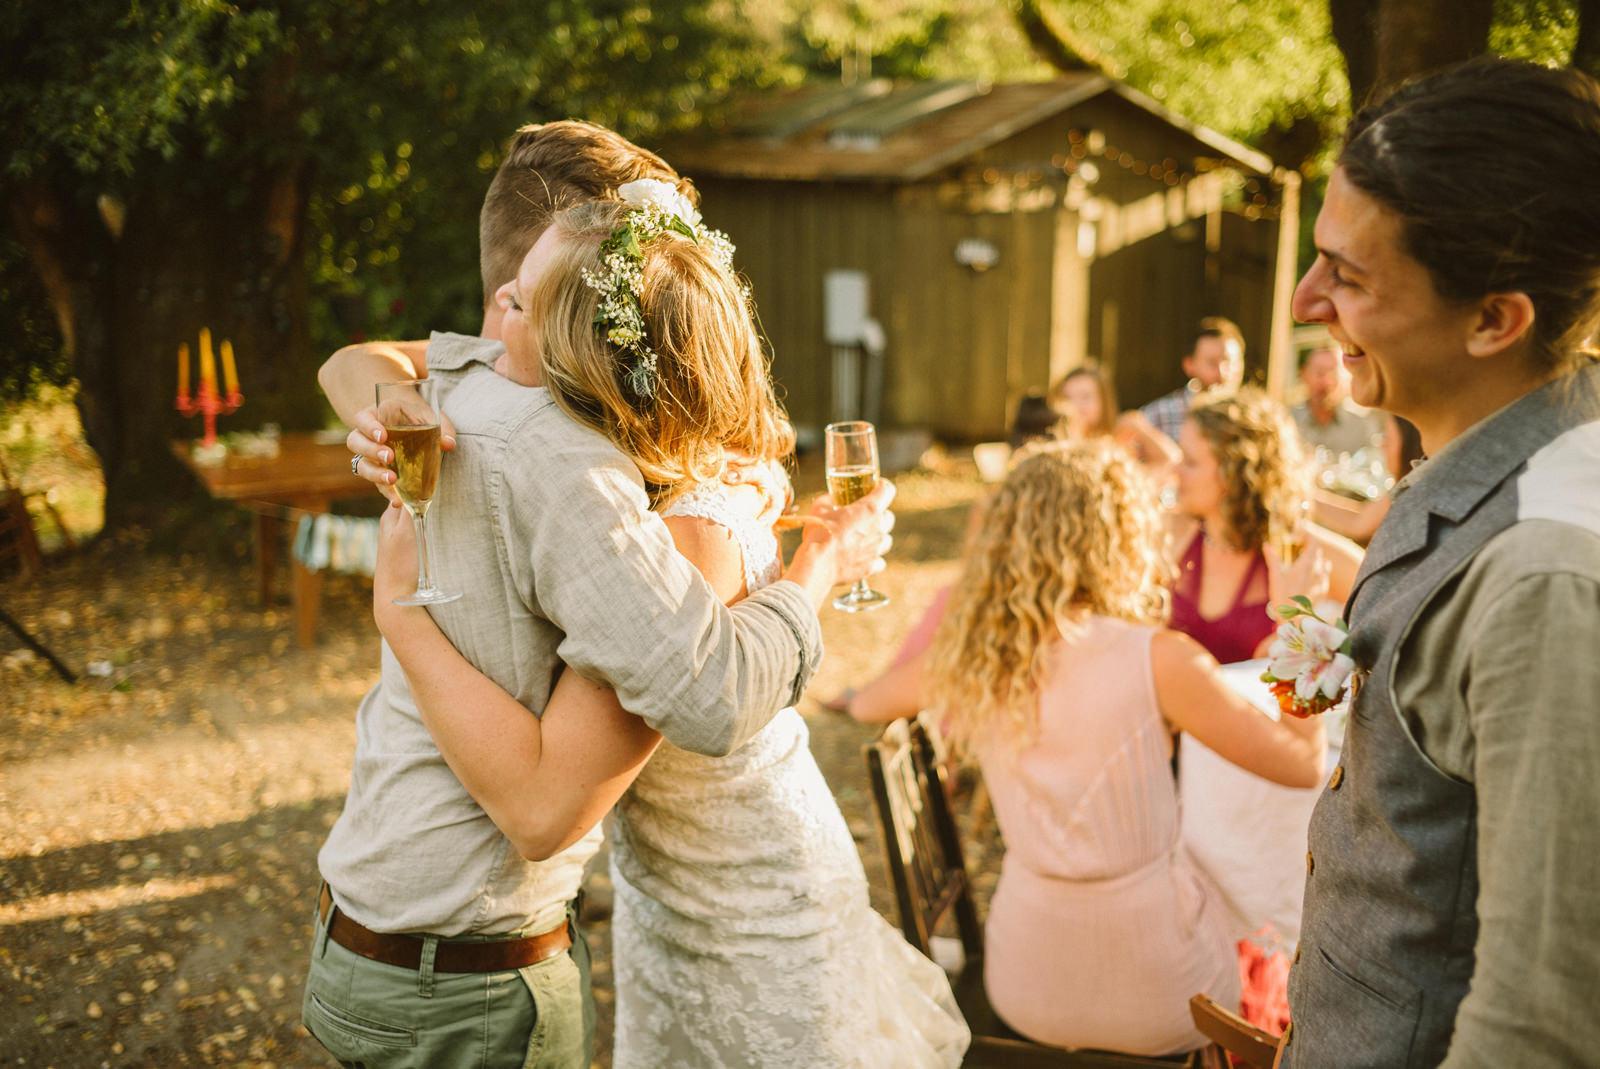 rivers-bend-retreat-wedding-089 RIVER'S BEND RETREAT WEDDING